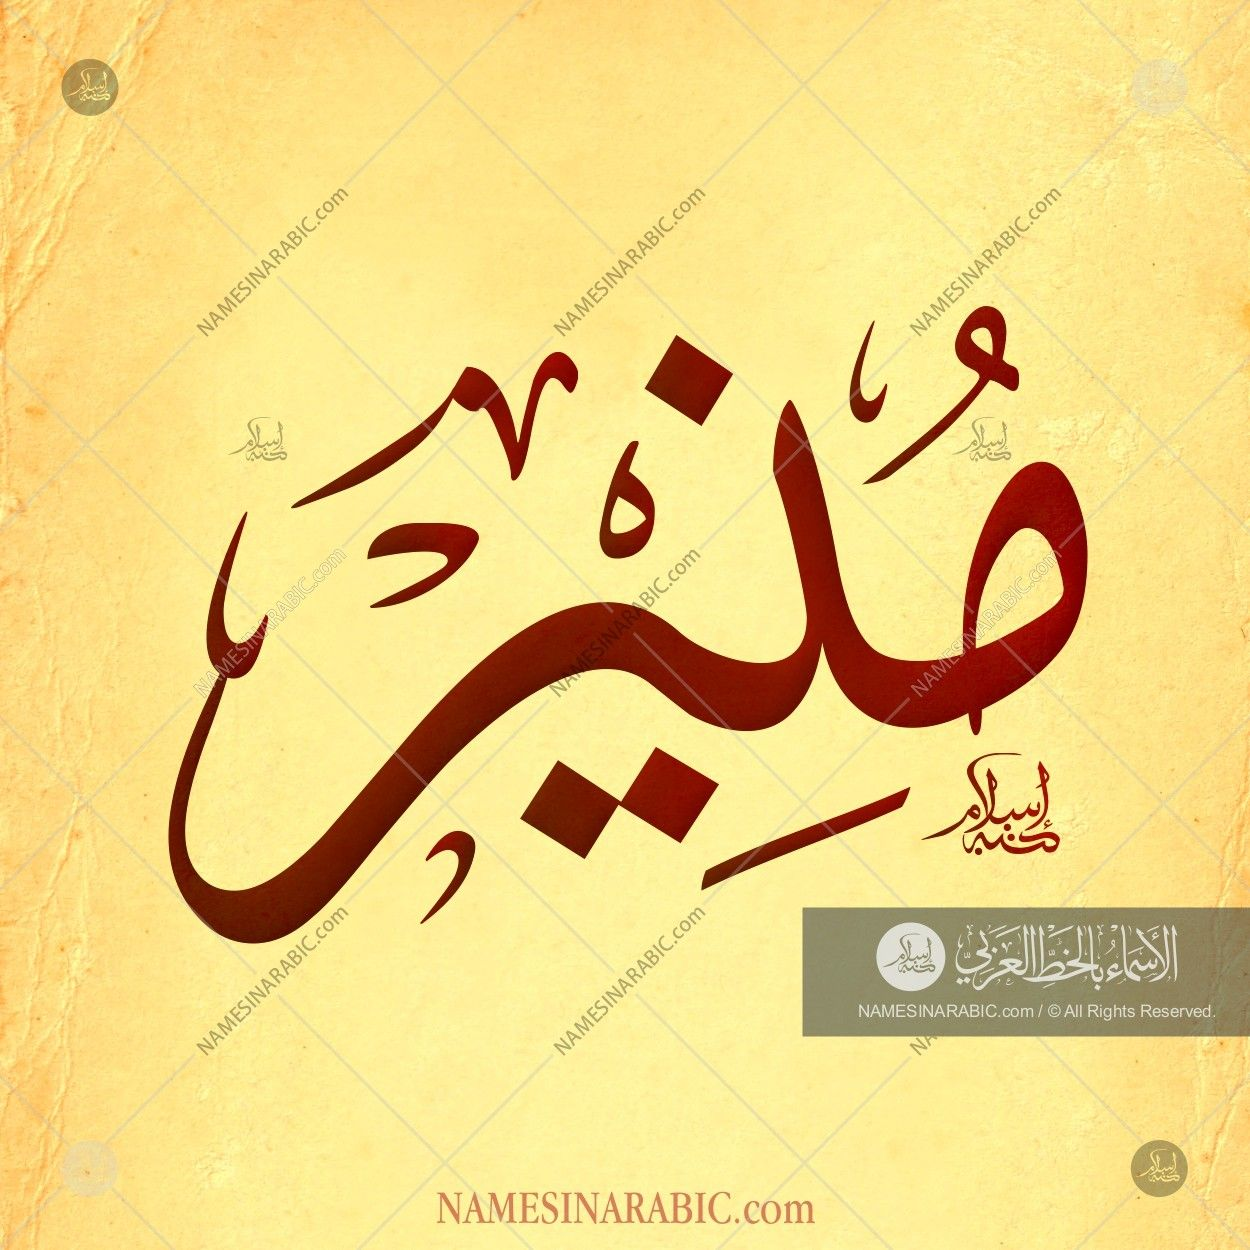 Munir Name In Arabic Calligraphy Calligraphy Name Calligraphy Arabic Calligraphy